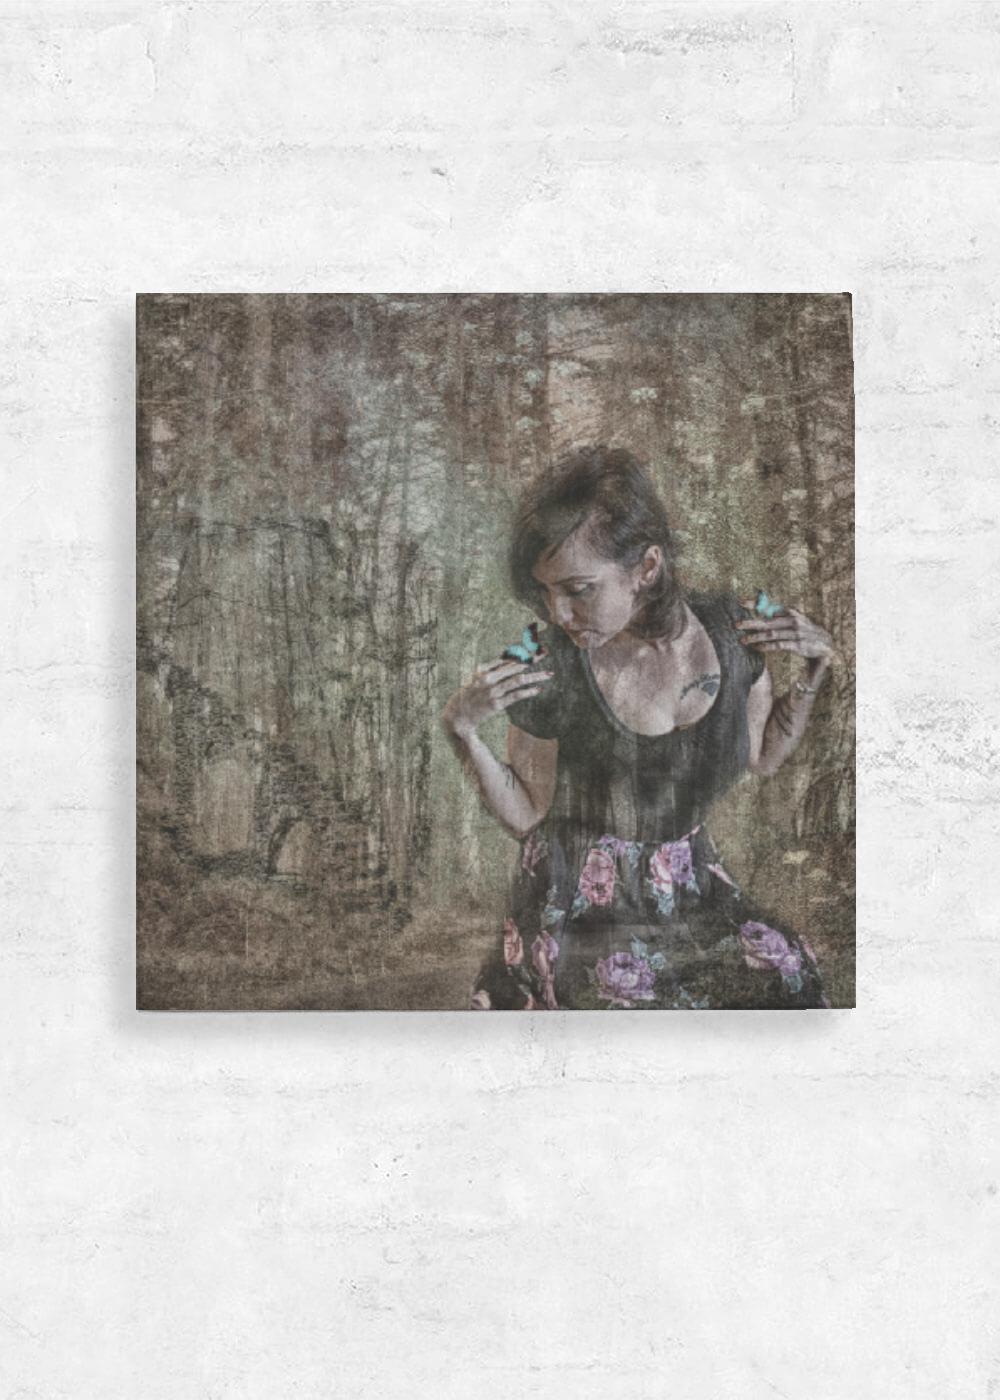 32e36fc7eafa She dreams of butterflies - Wood Wall Art - 12x12 by...